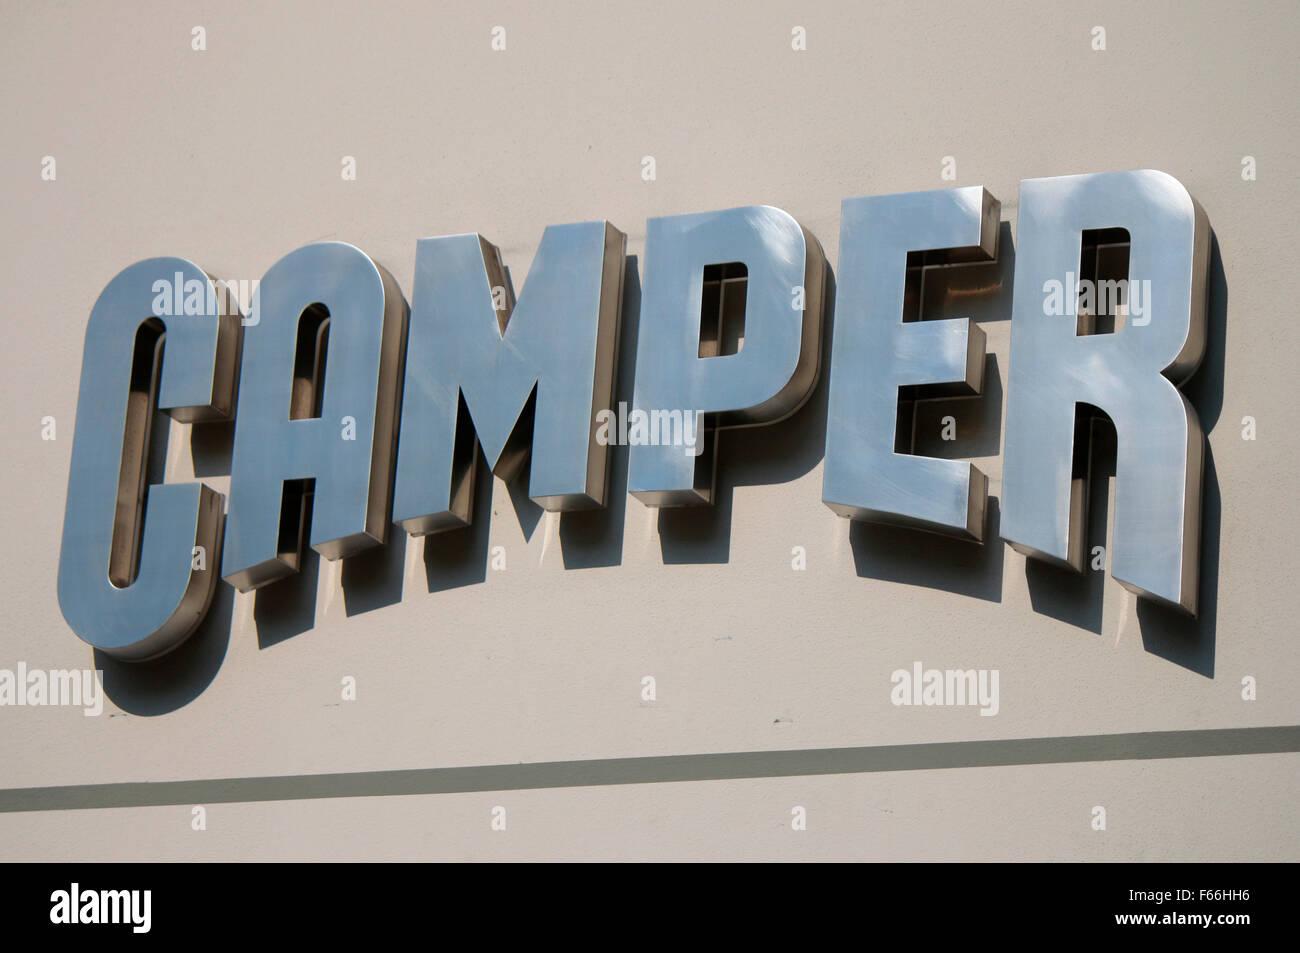 Markennamen: 'Camper', Berlin. - Stock Image